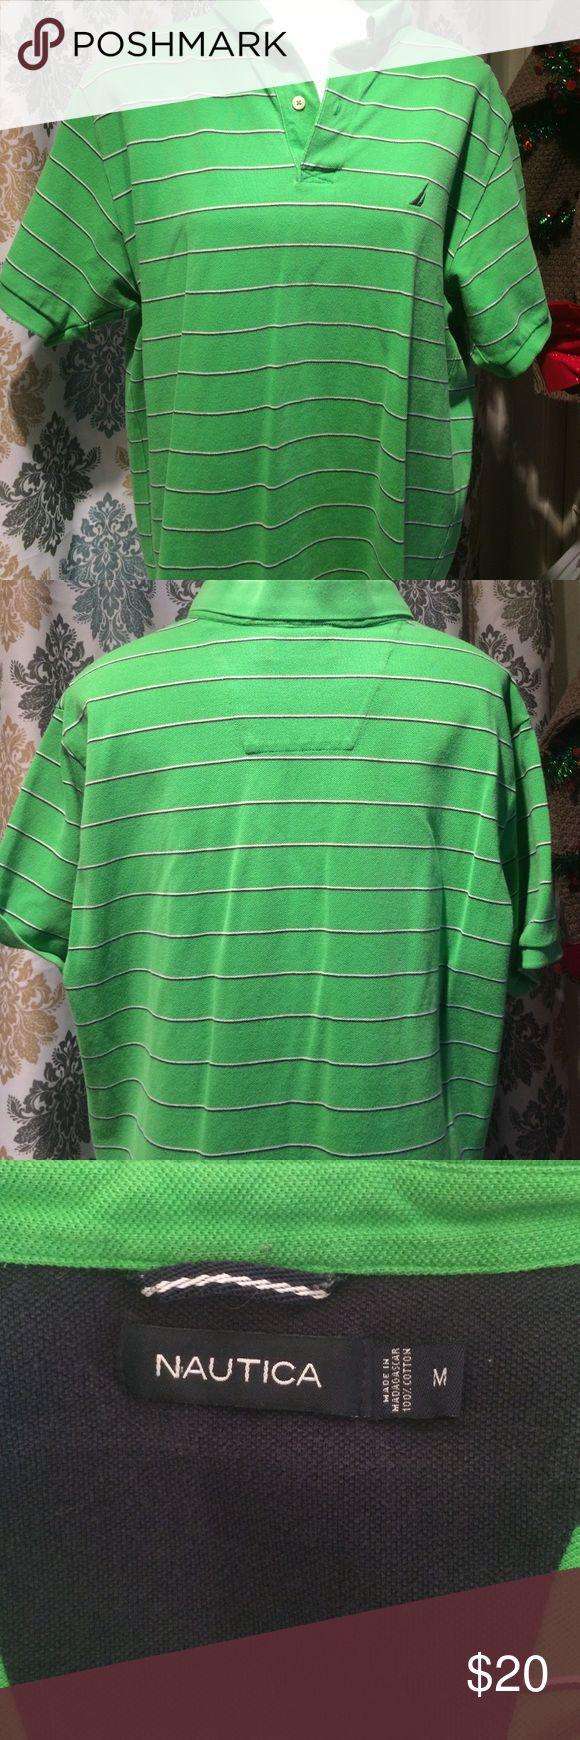 Nautica polo shirt Nautica green polo shirt with black & white stripes. Good condition. Nautica Shirts Polos